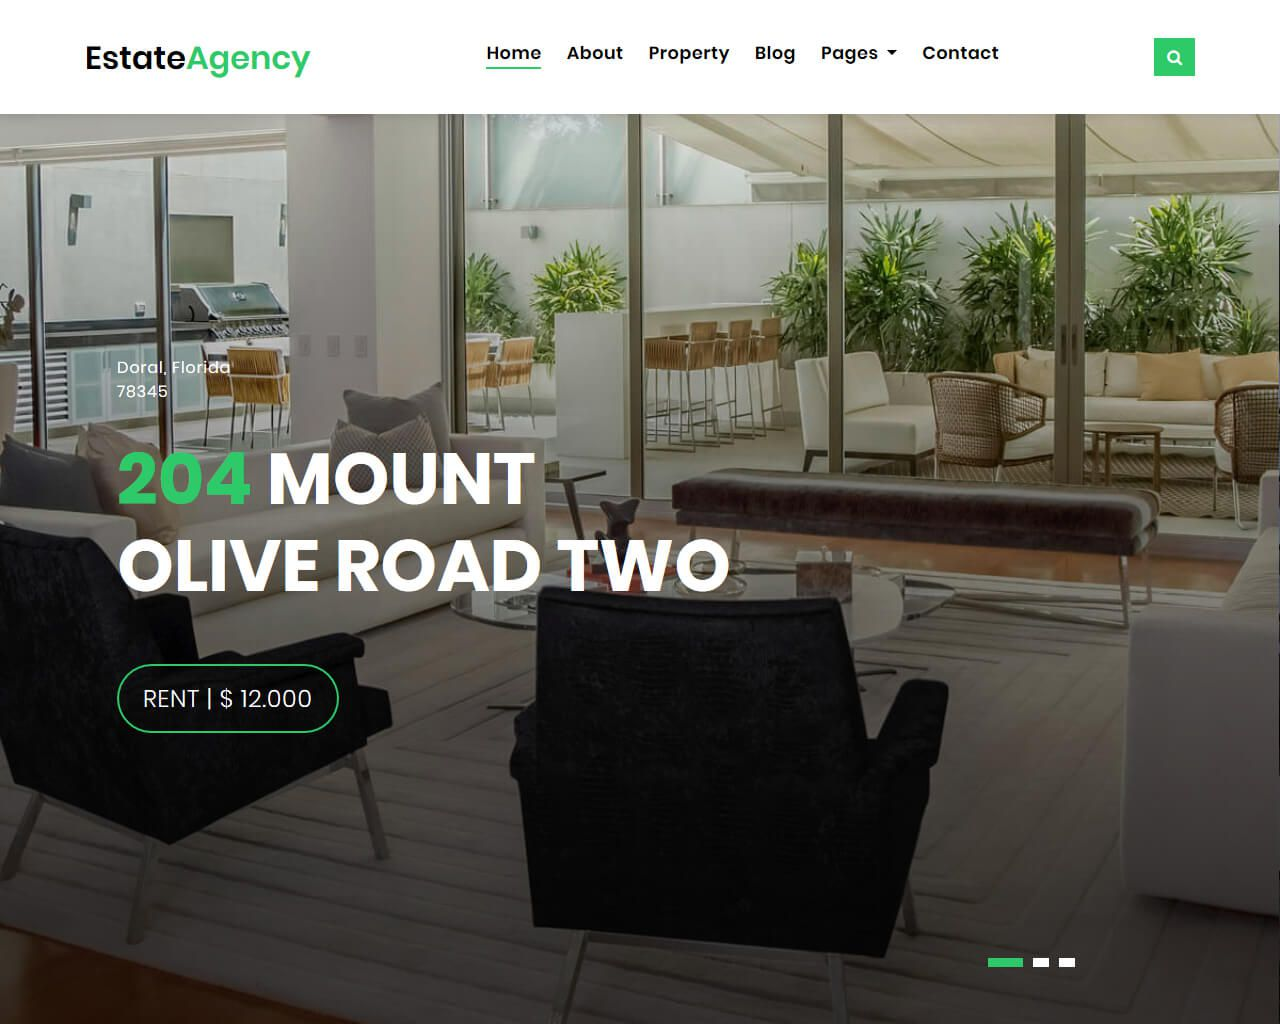 007 Striking Real Estate Website Template Sample  Templates Bootstrap Free Html5 Best WordpresFull